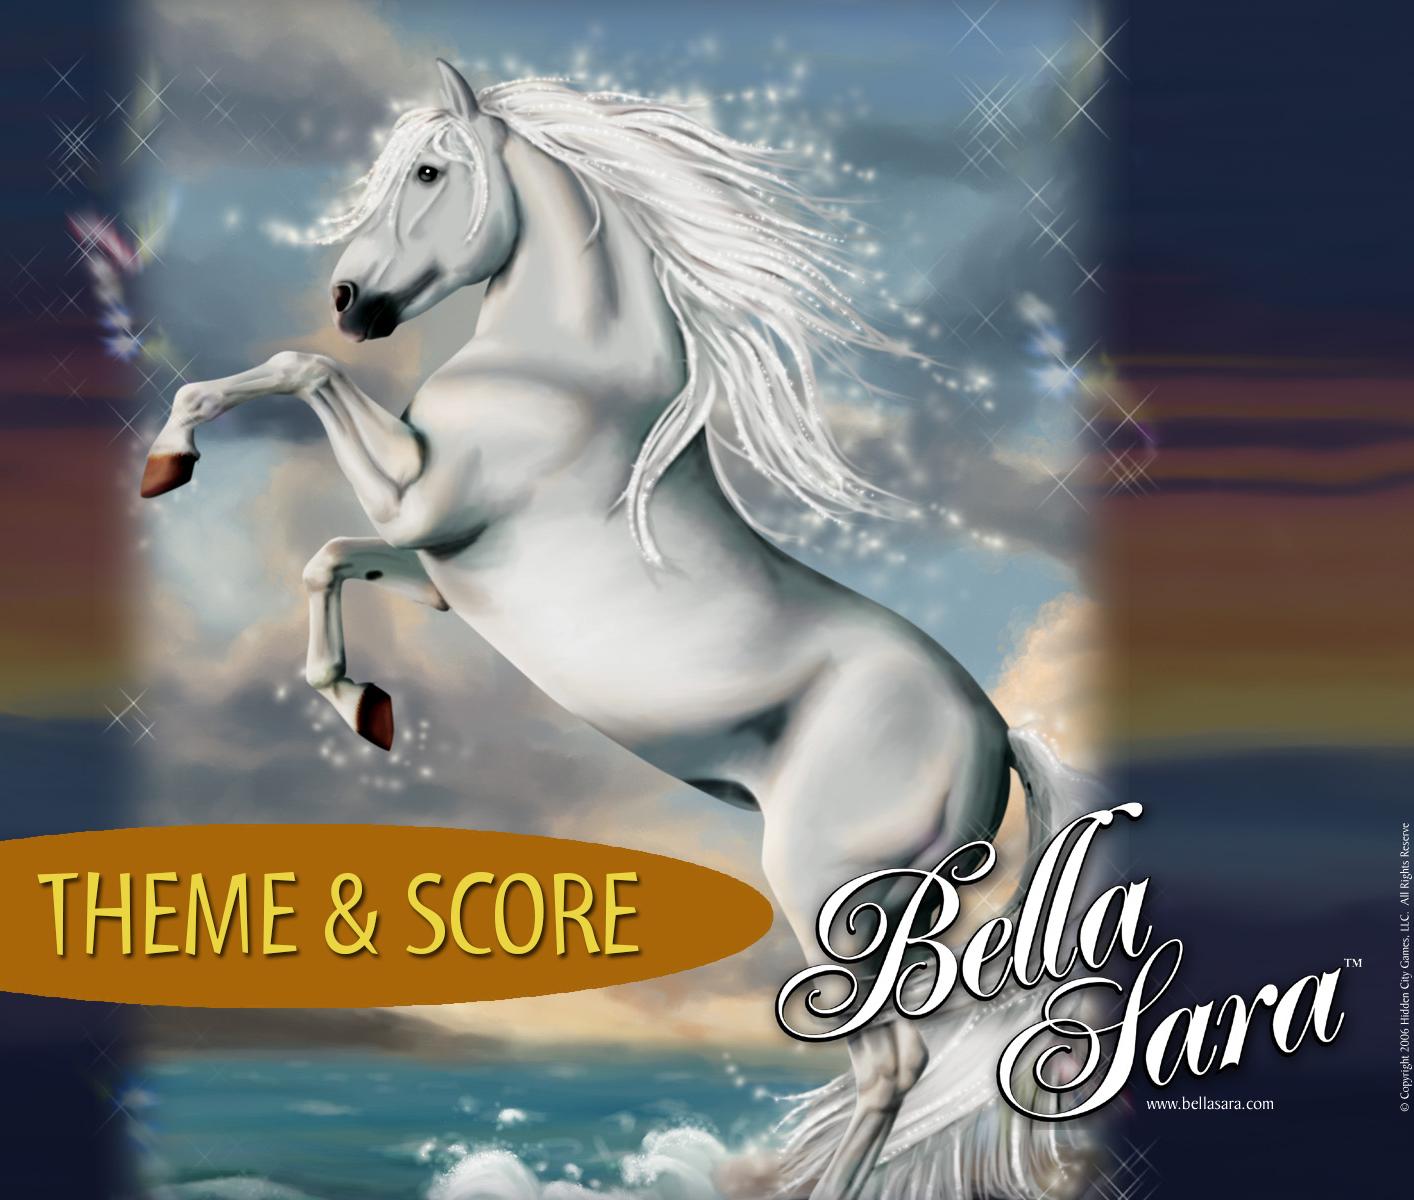 Bella-Sara score